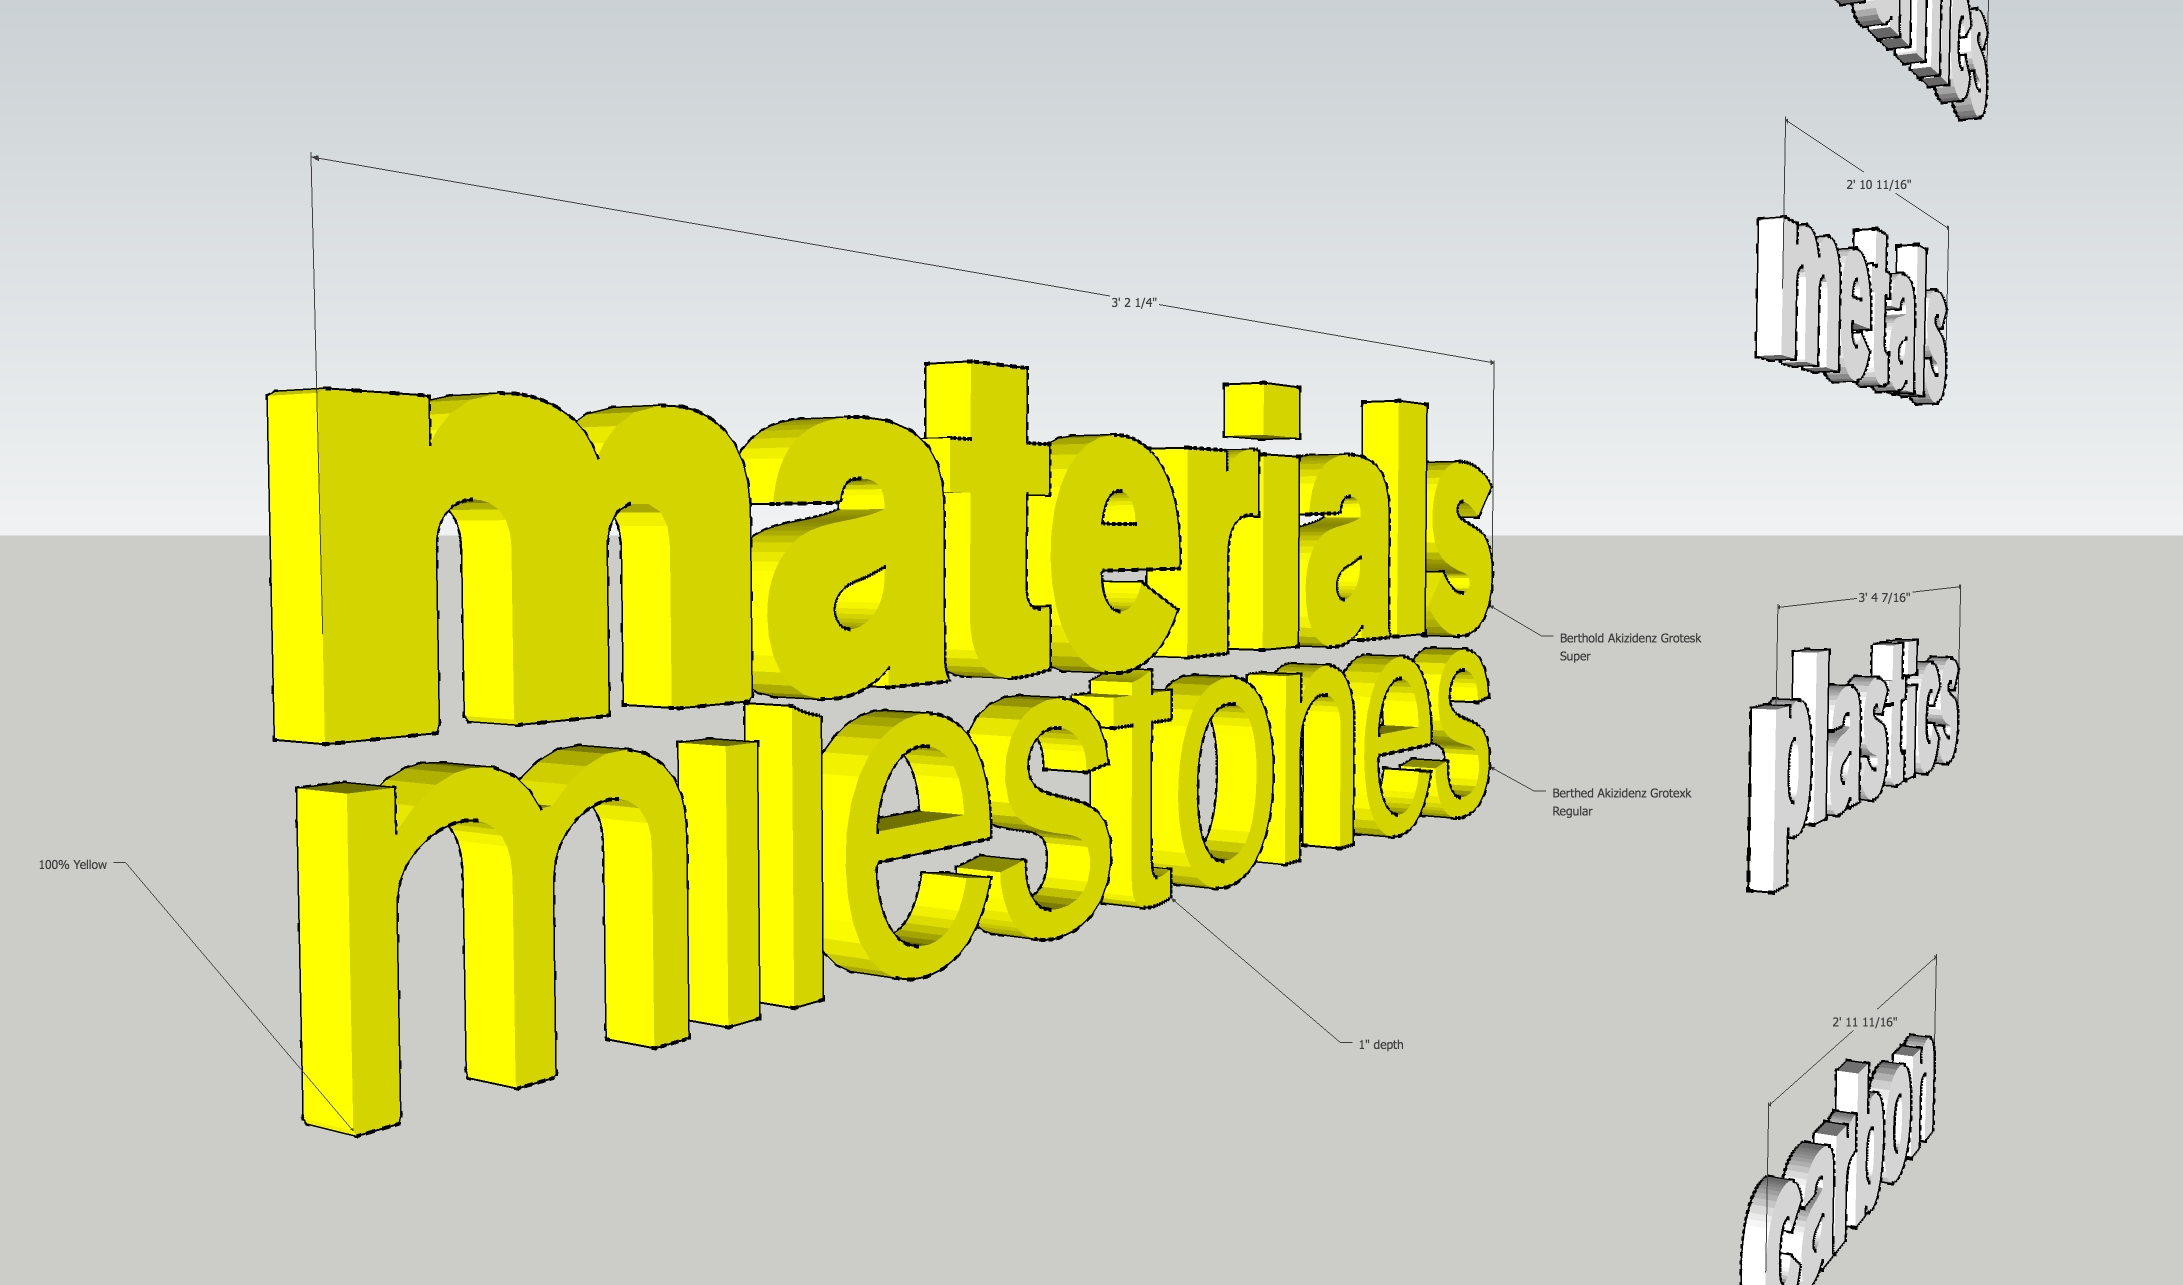 3D Titles Plan